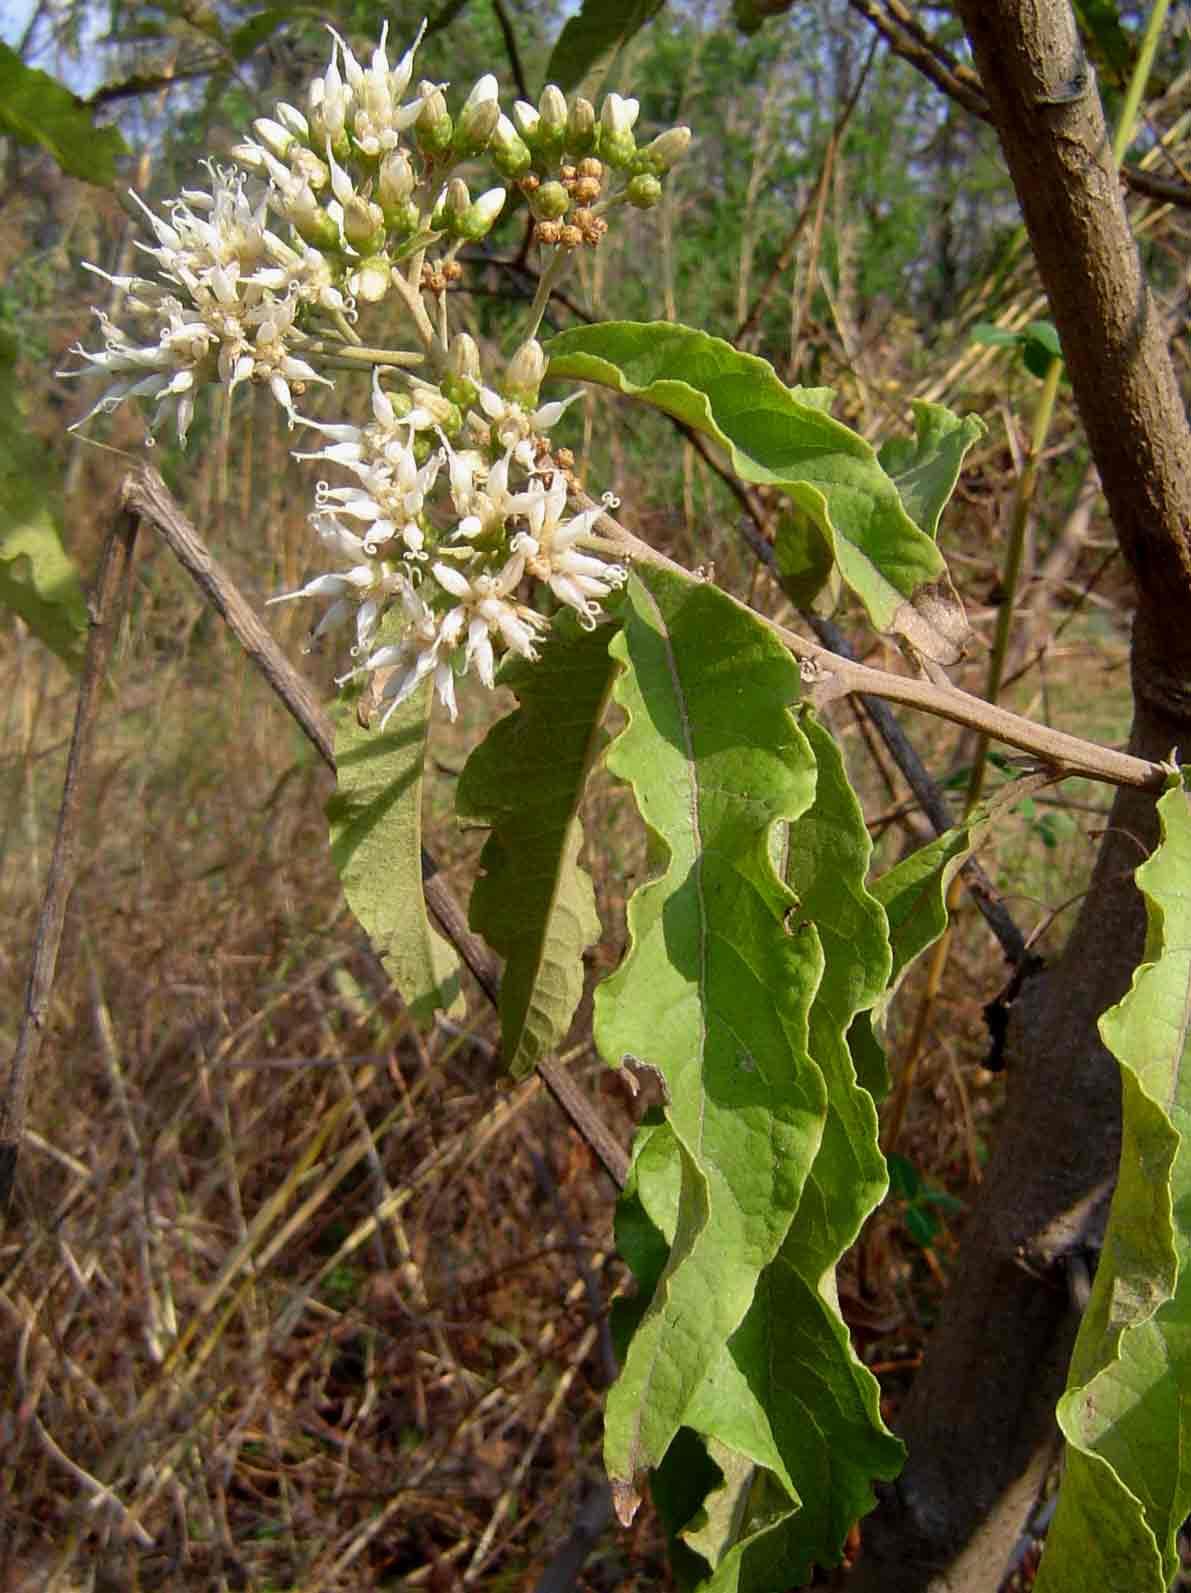 Vernonia amygdalina